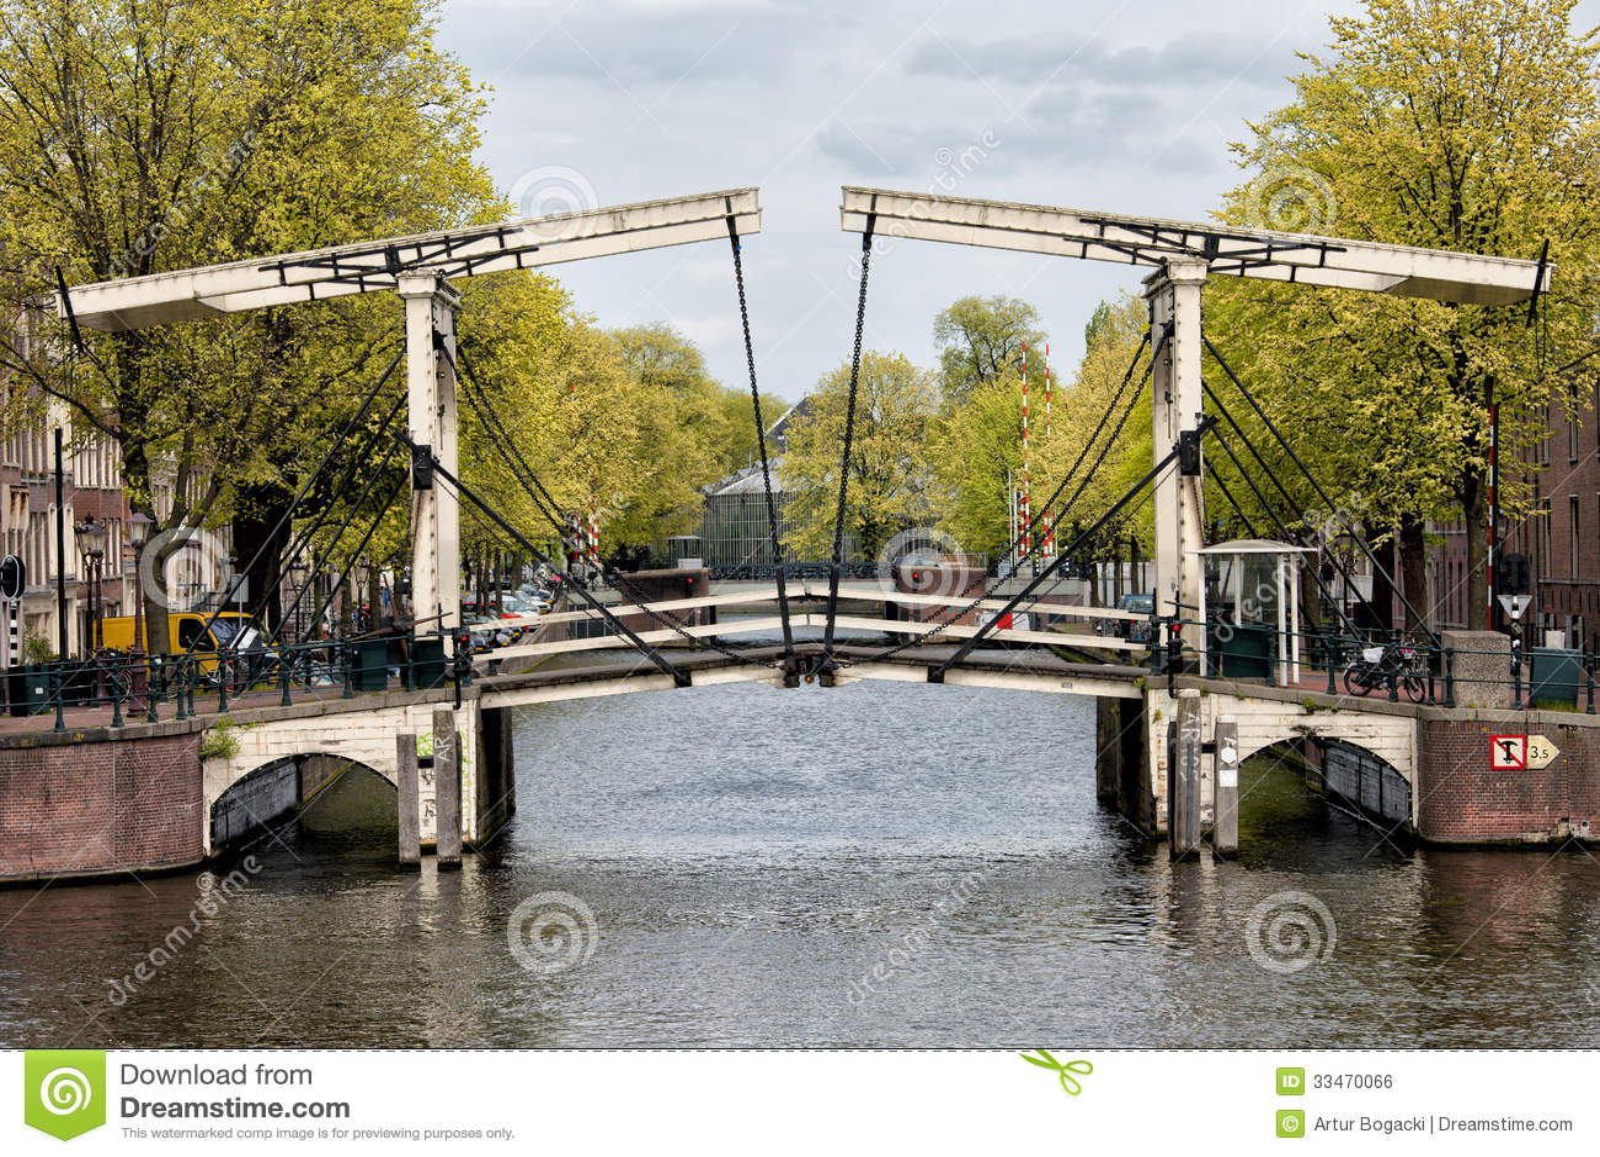 ophaalbrug in amsterdam stock foto afbeelding bestaande uit amsterdam 33470066. Black Bedroom Furniture Sets. Home Design Ideas